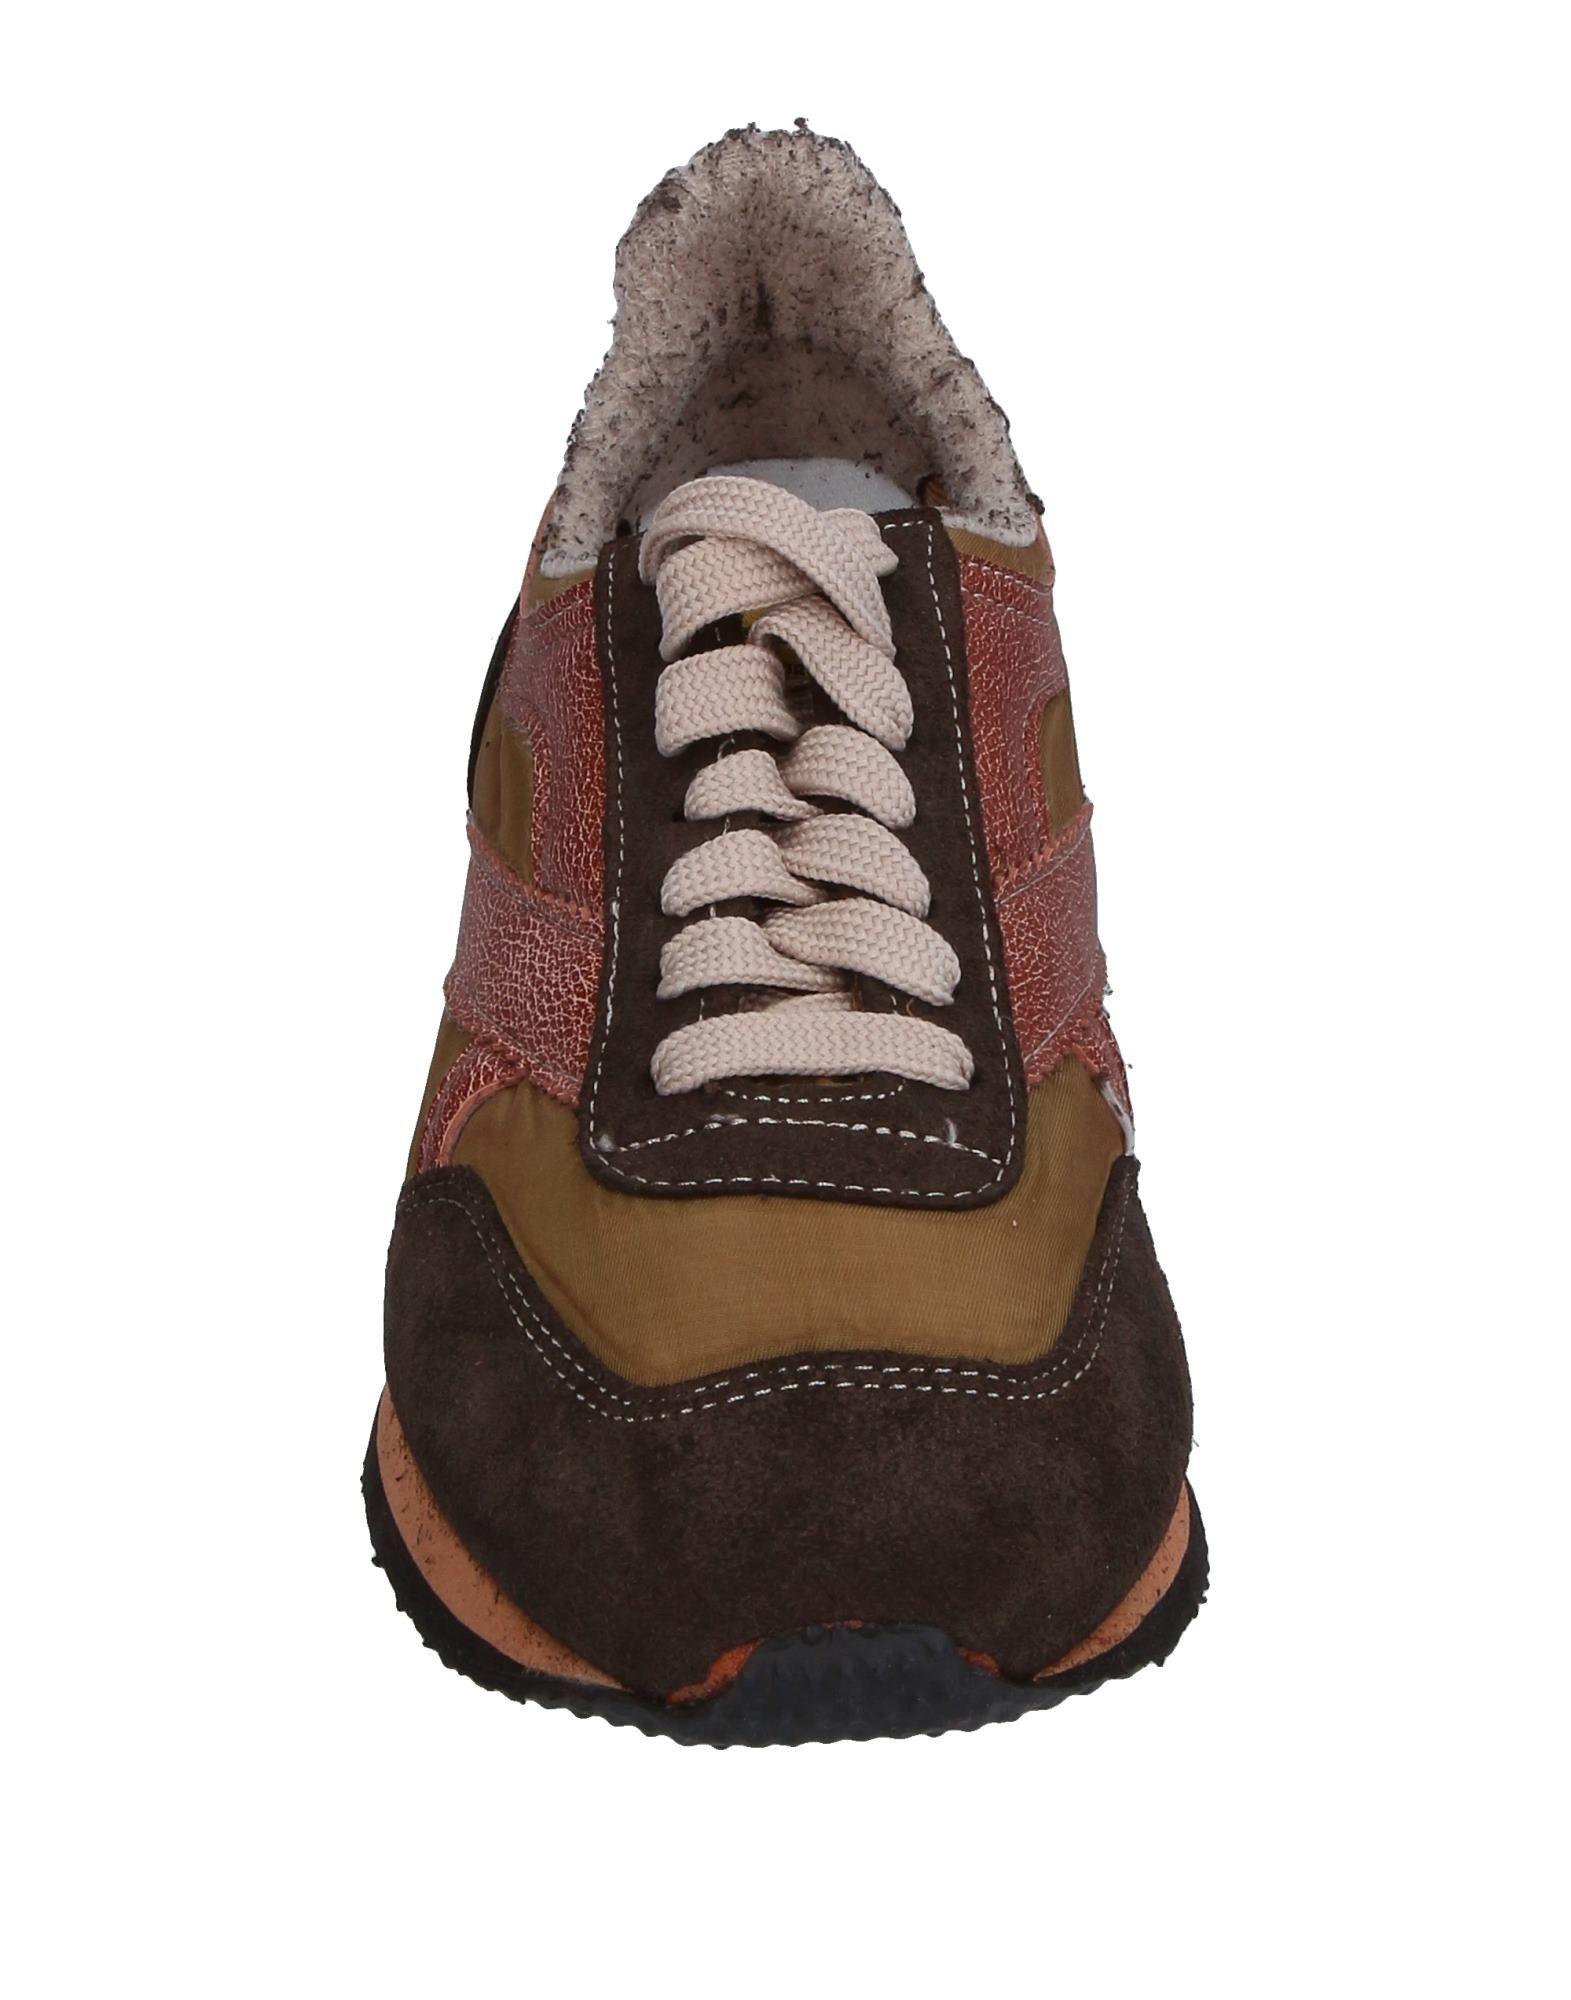 Walsh Walsh Walsh Sneakers Damen Gutes Preis-Leistungs-Verhältnis, es lohnt sich a6d7df